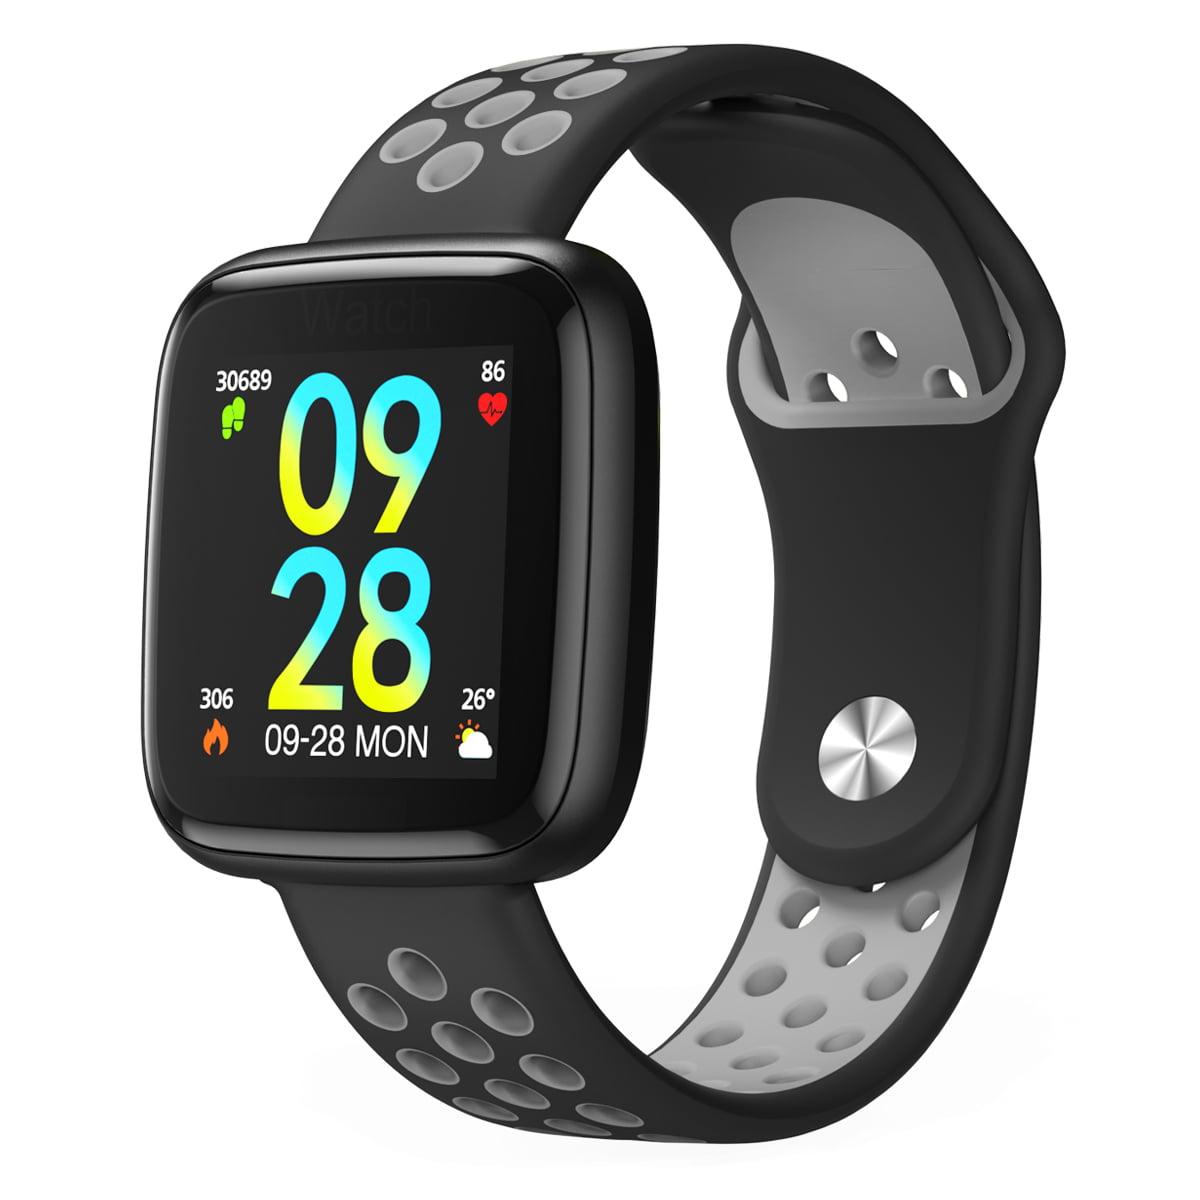 Fitness Tracker Ip68 Waterproof Activity With Heart Rate Monitor Bluetooth Multiple Sport Modes Smart Watch Wireless Bracelet Sleep